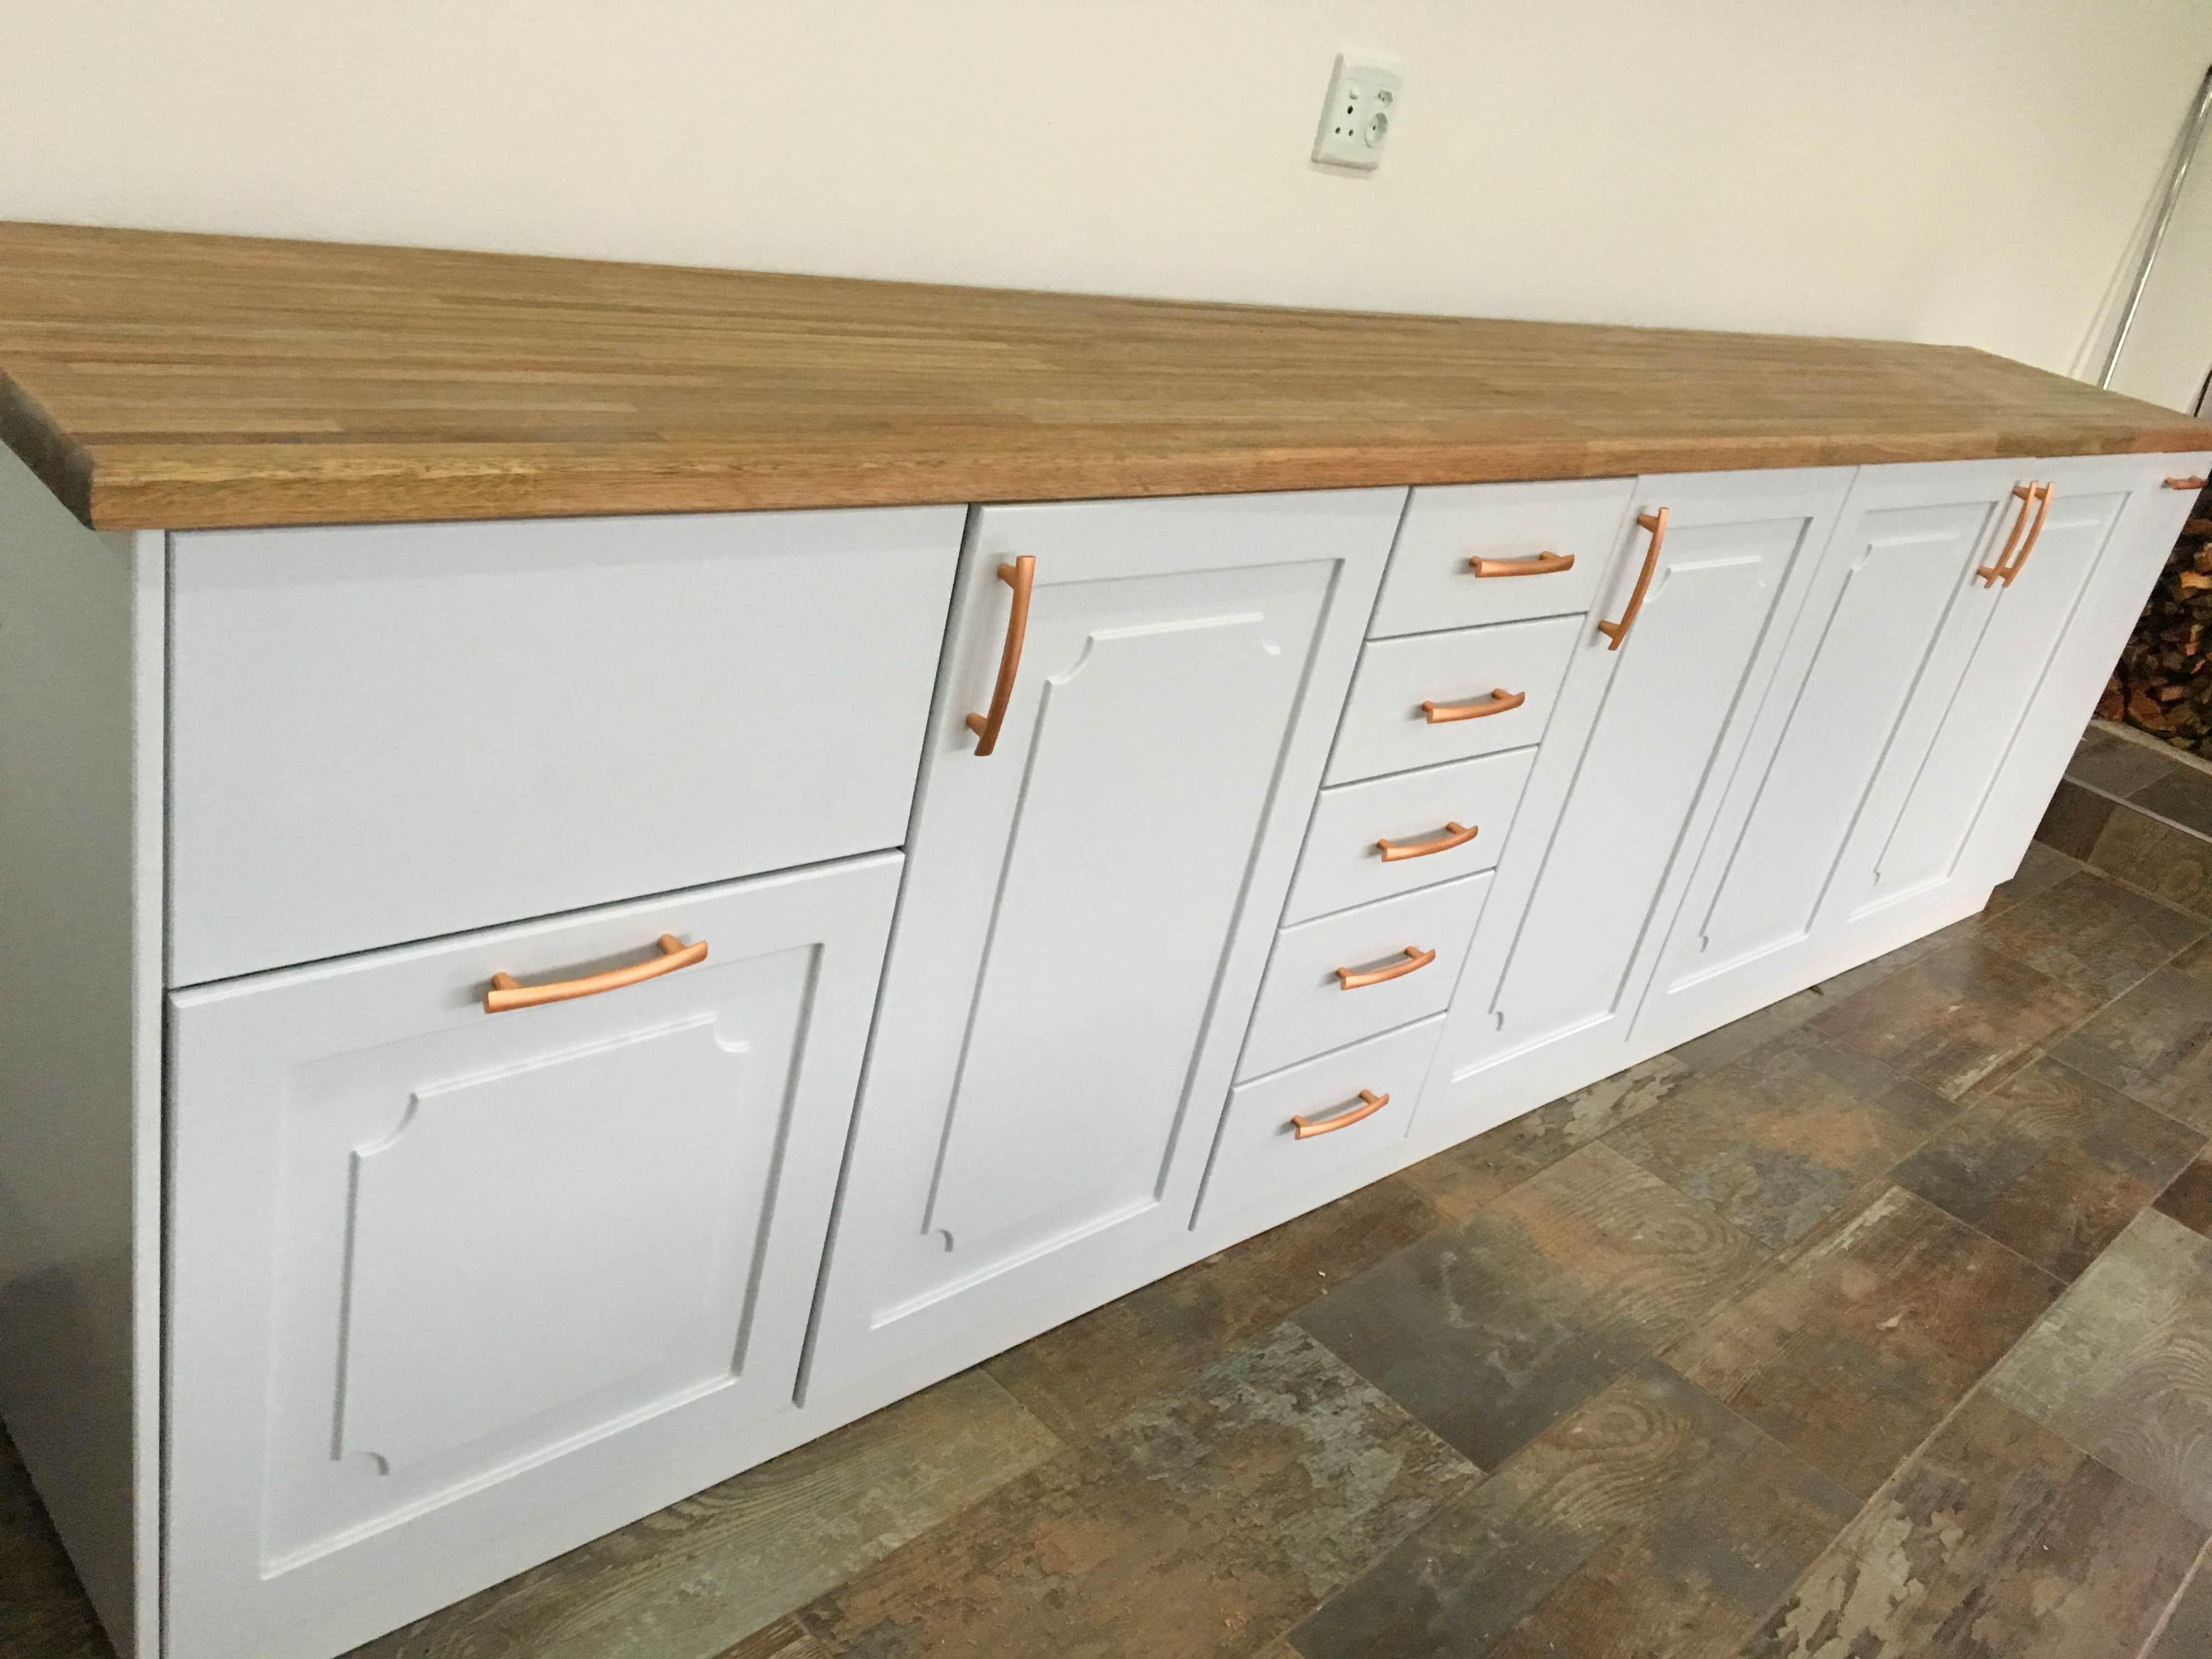 Design Furniture - White Wooden Cabinet